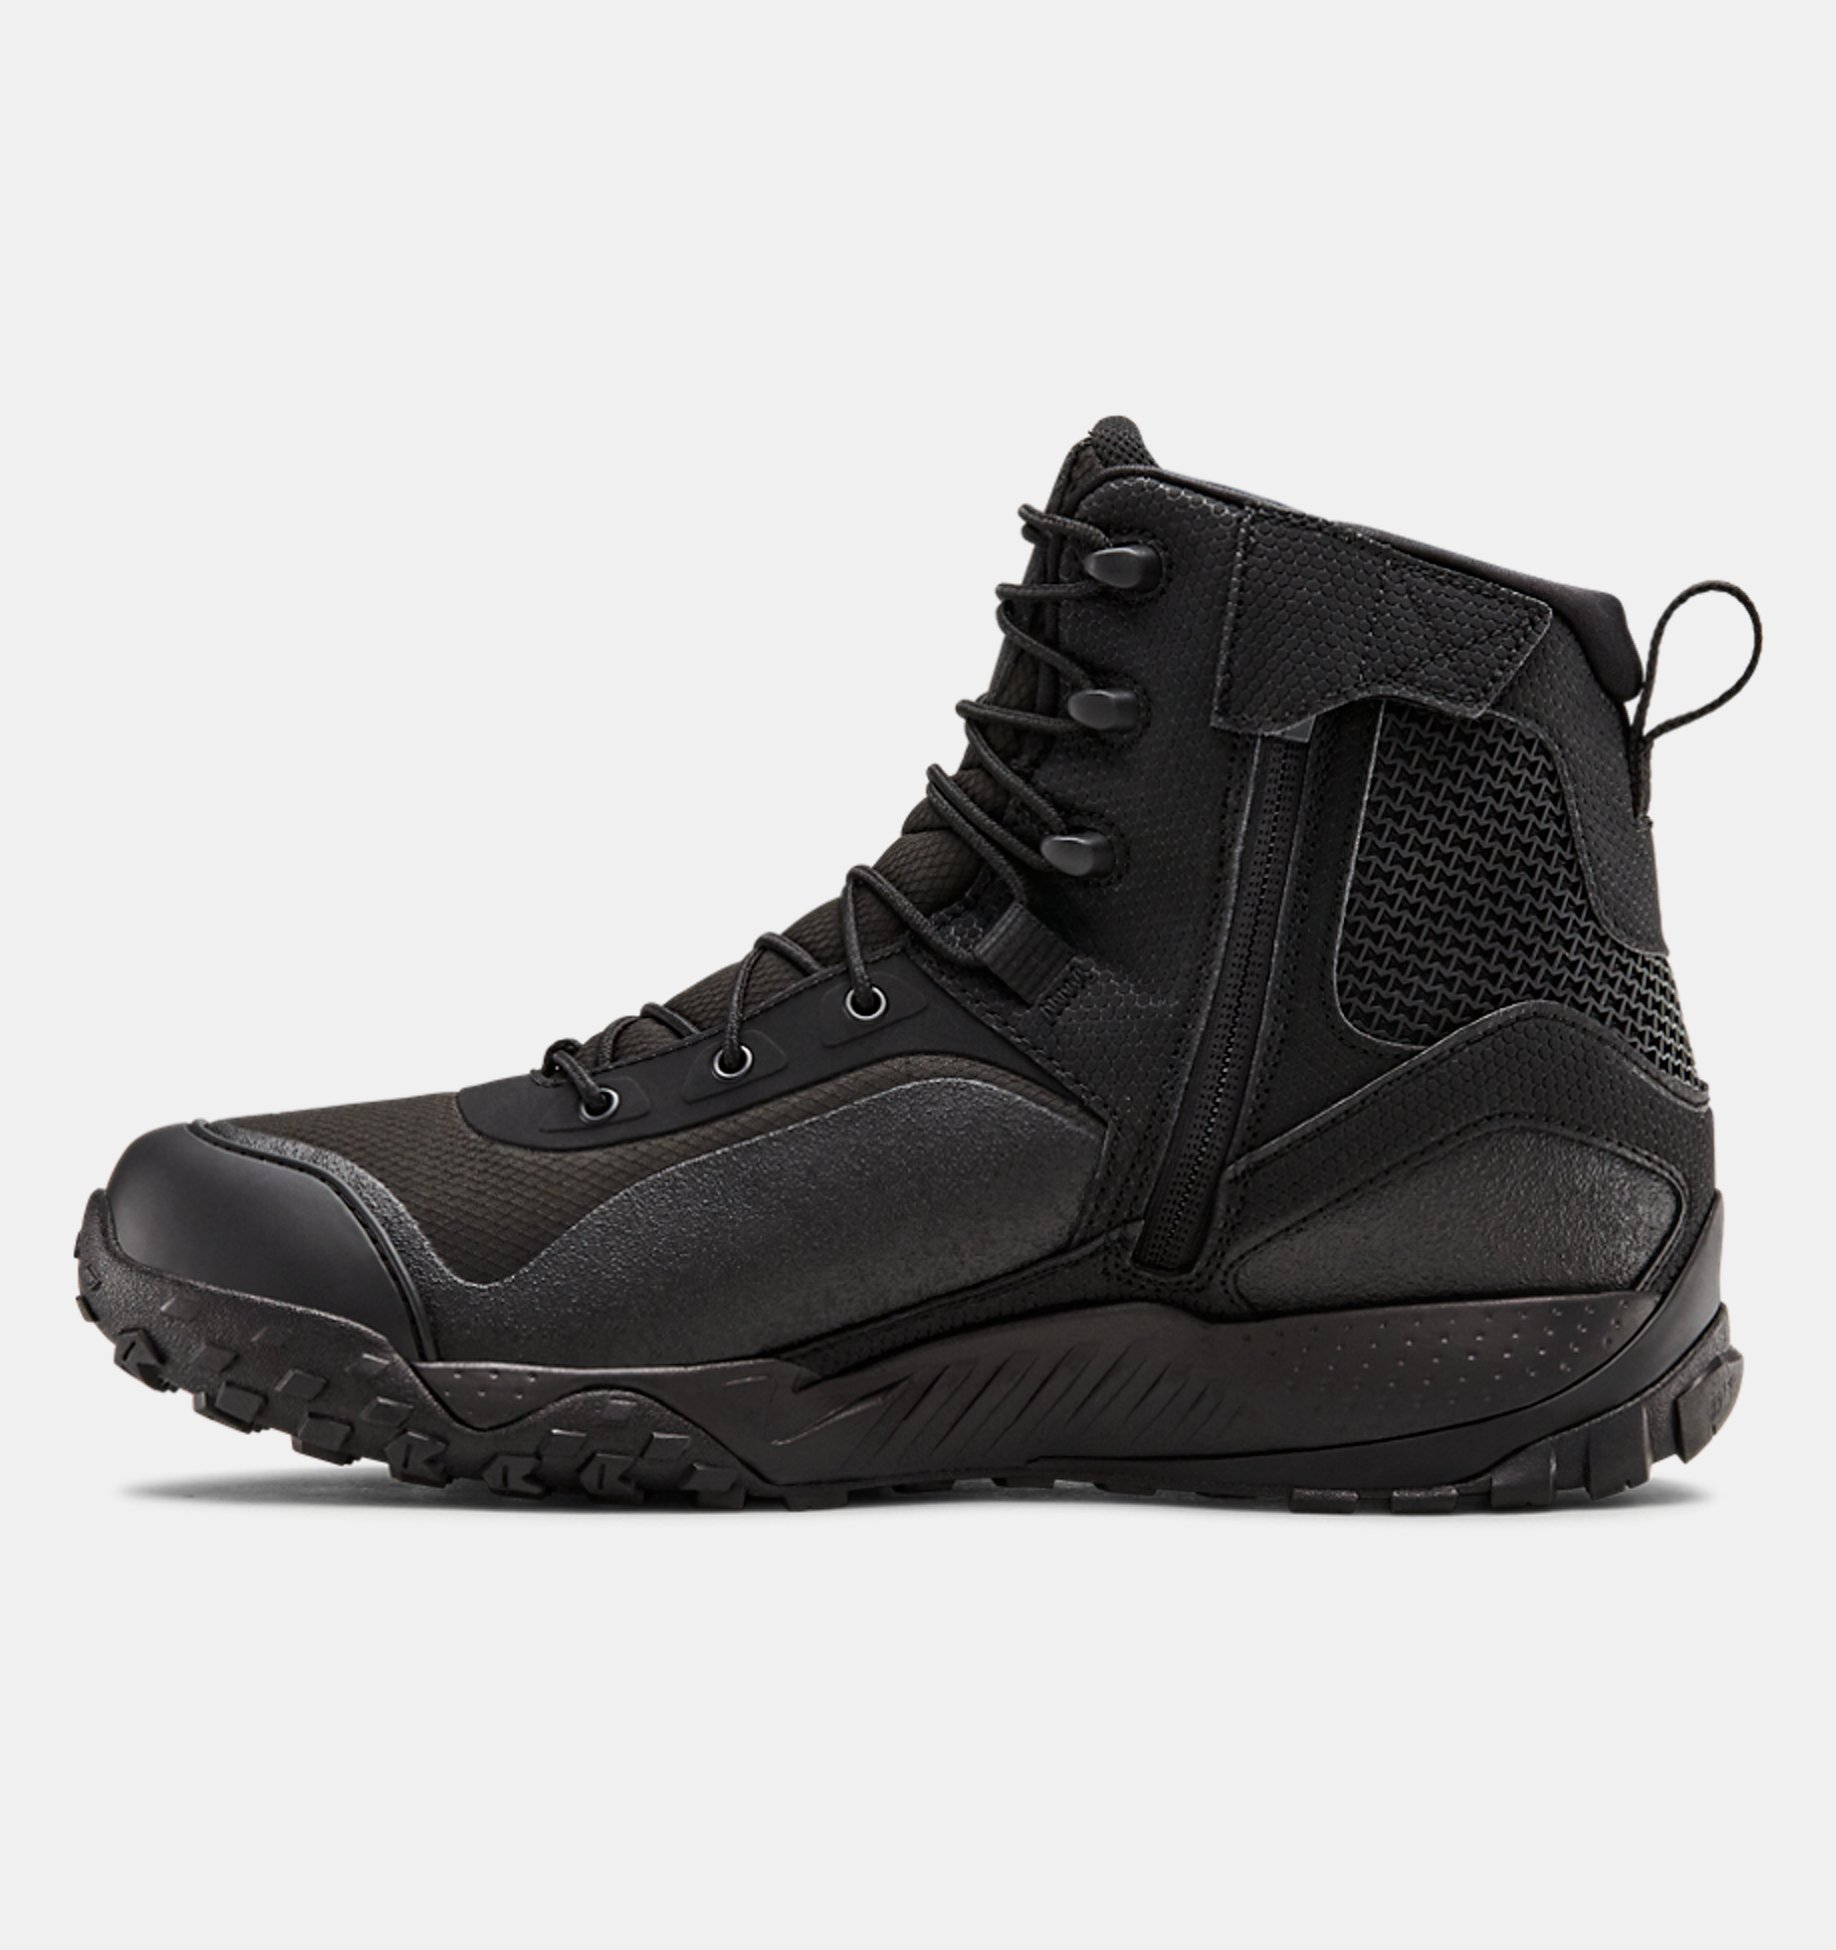 Men's UA Valsetz RTS 1.5 Side Zip Tactical Boots, Black, pdpZoomDesktop image number 1